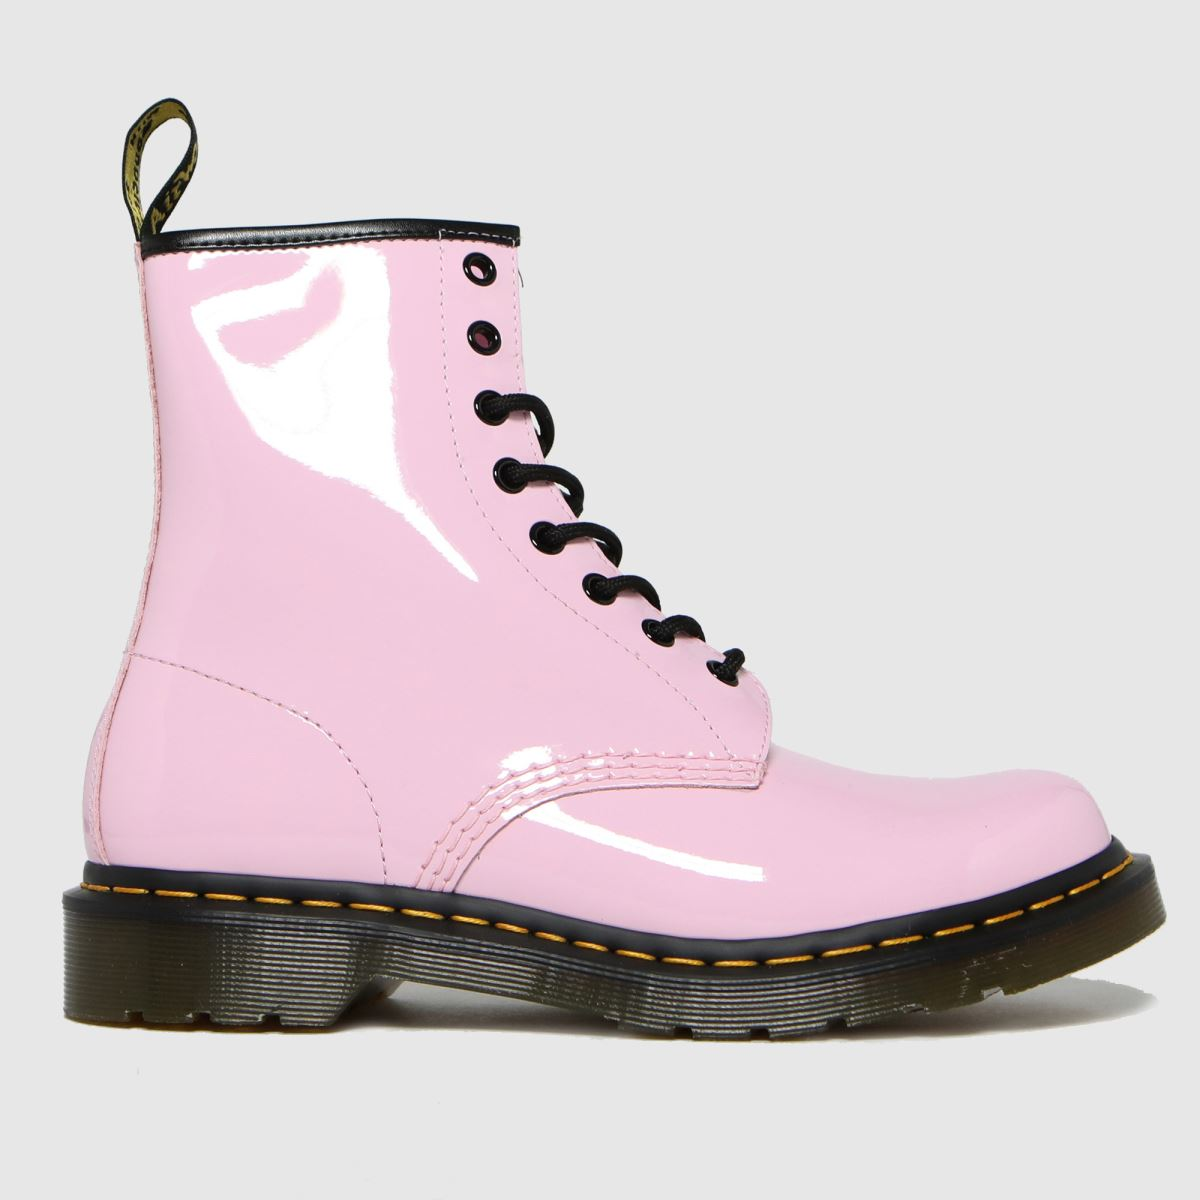 Dr Martens Pale Pink 1460 Boots